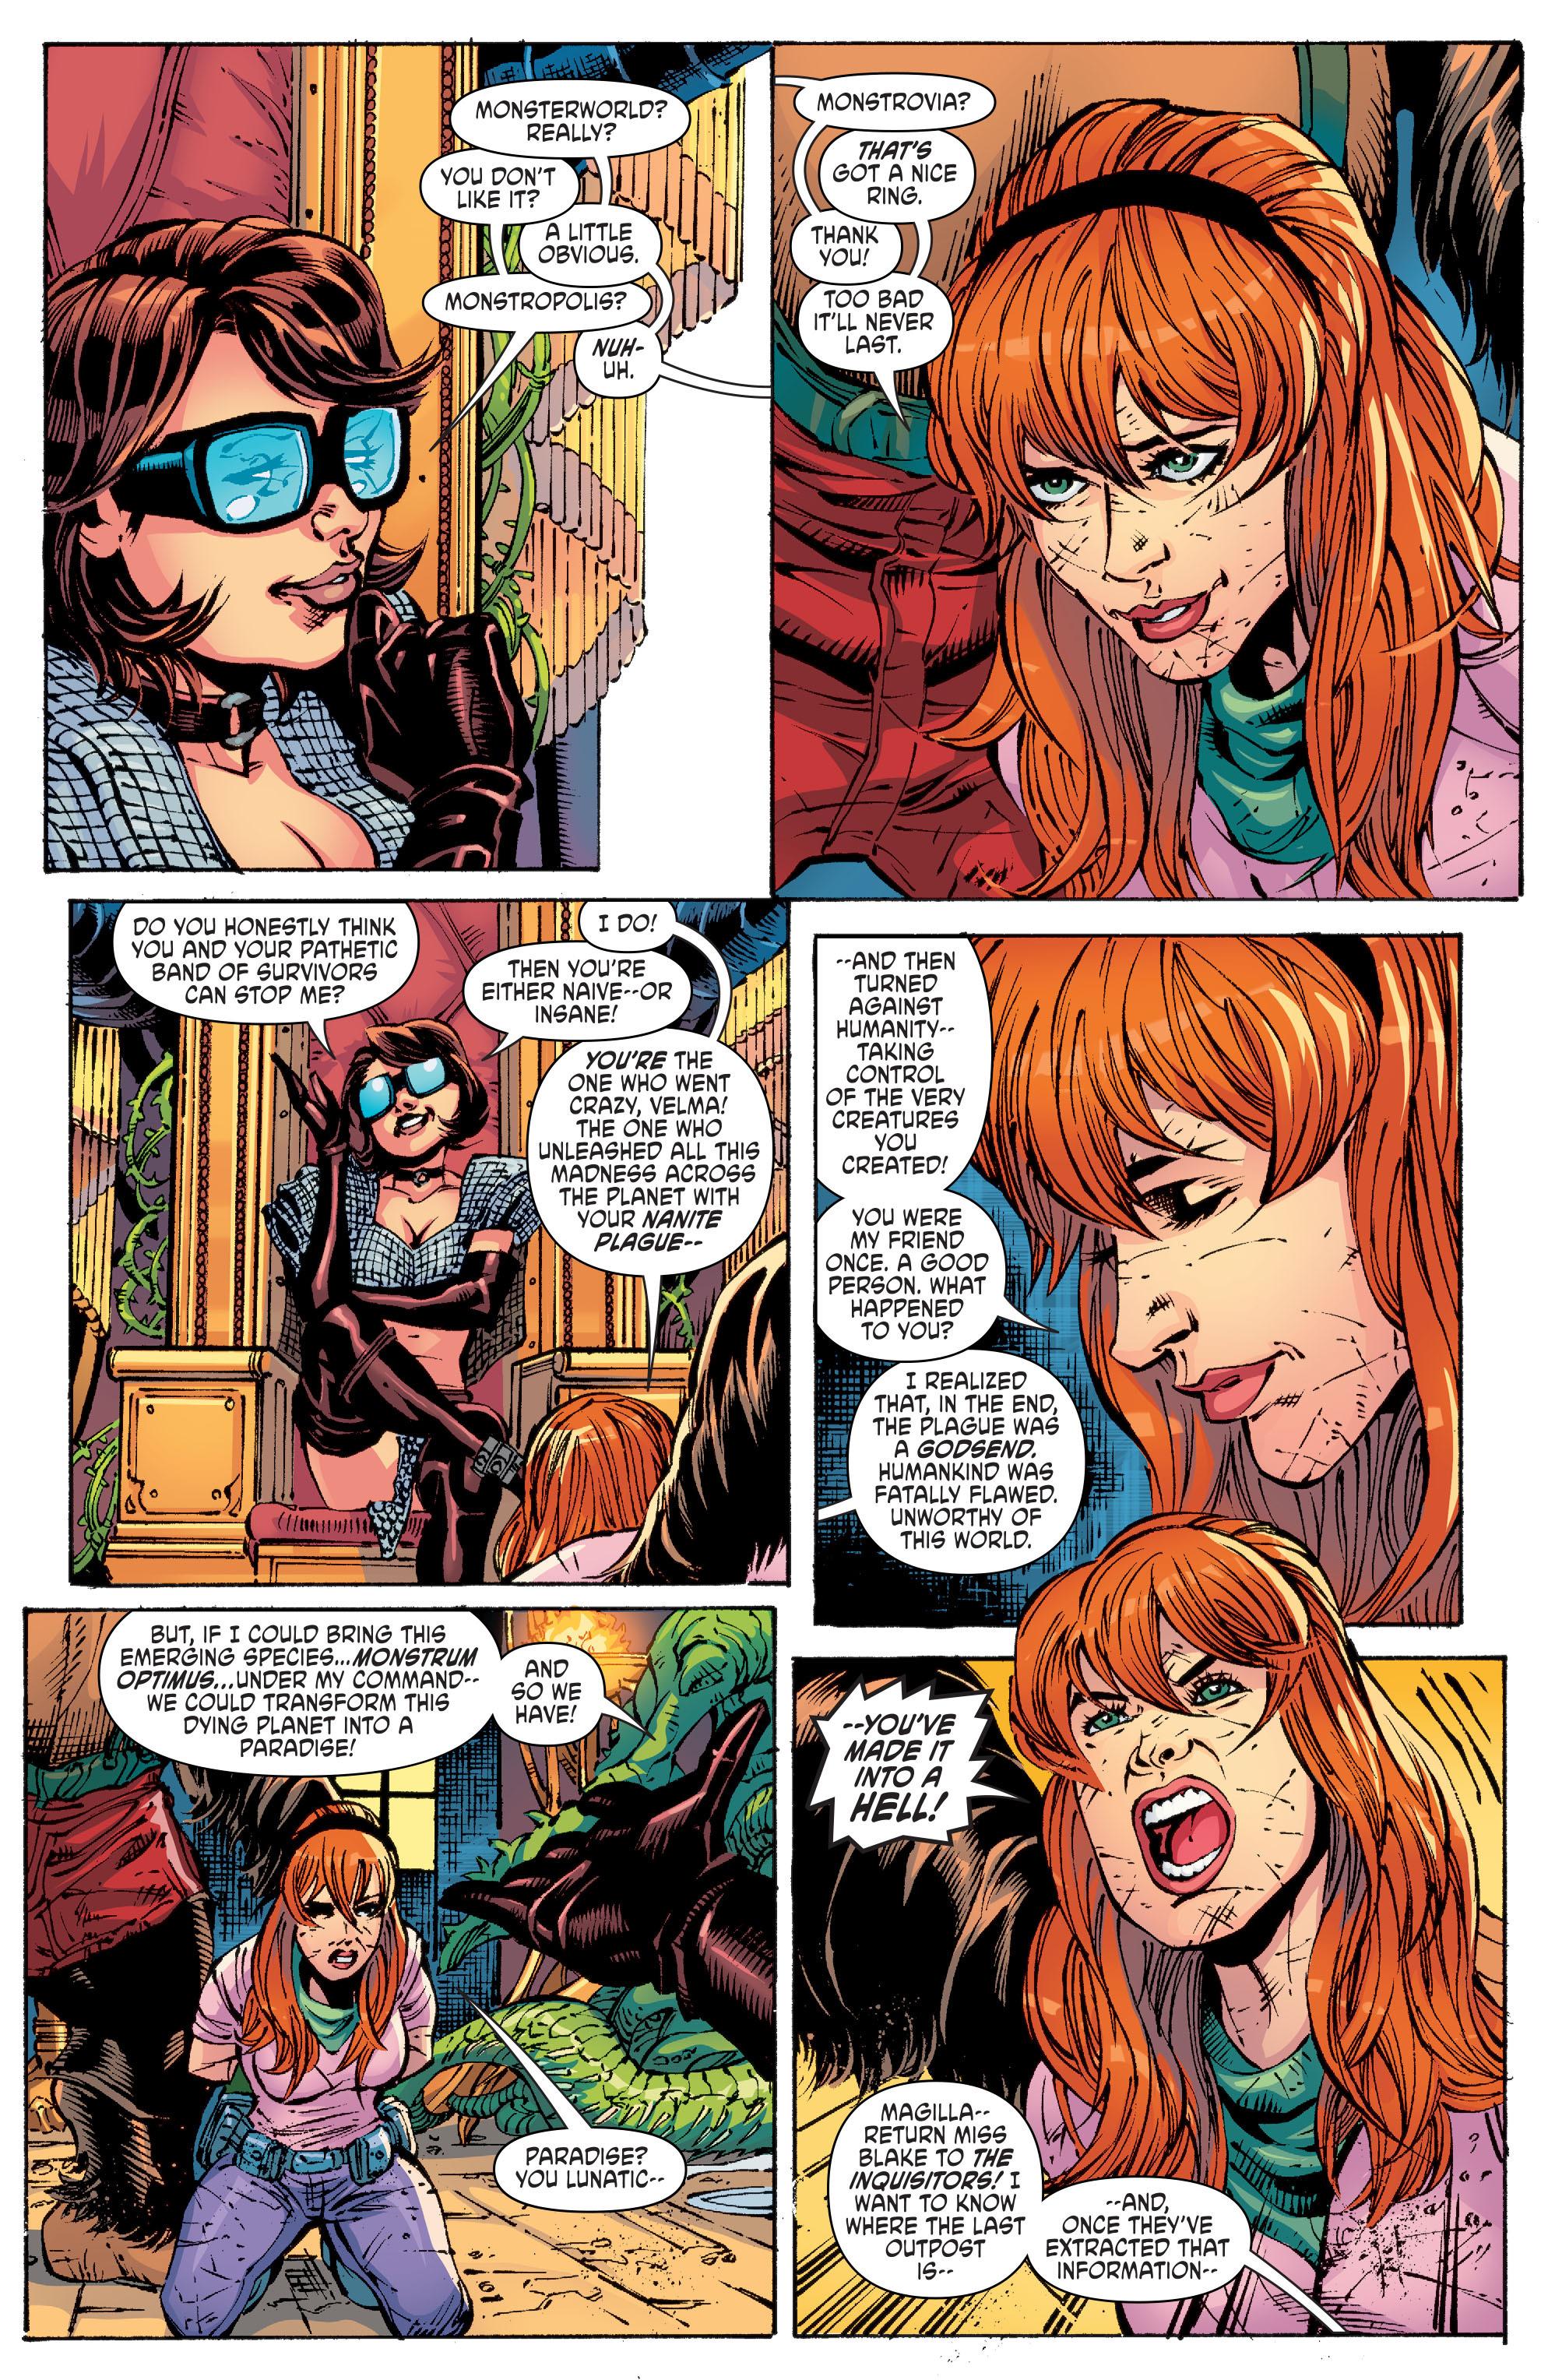 Read online Scooby Apocalypse comic -  Issue #10 - 6